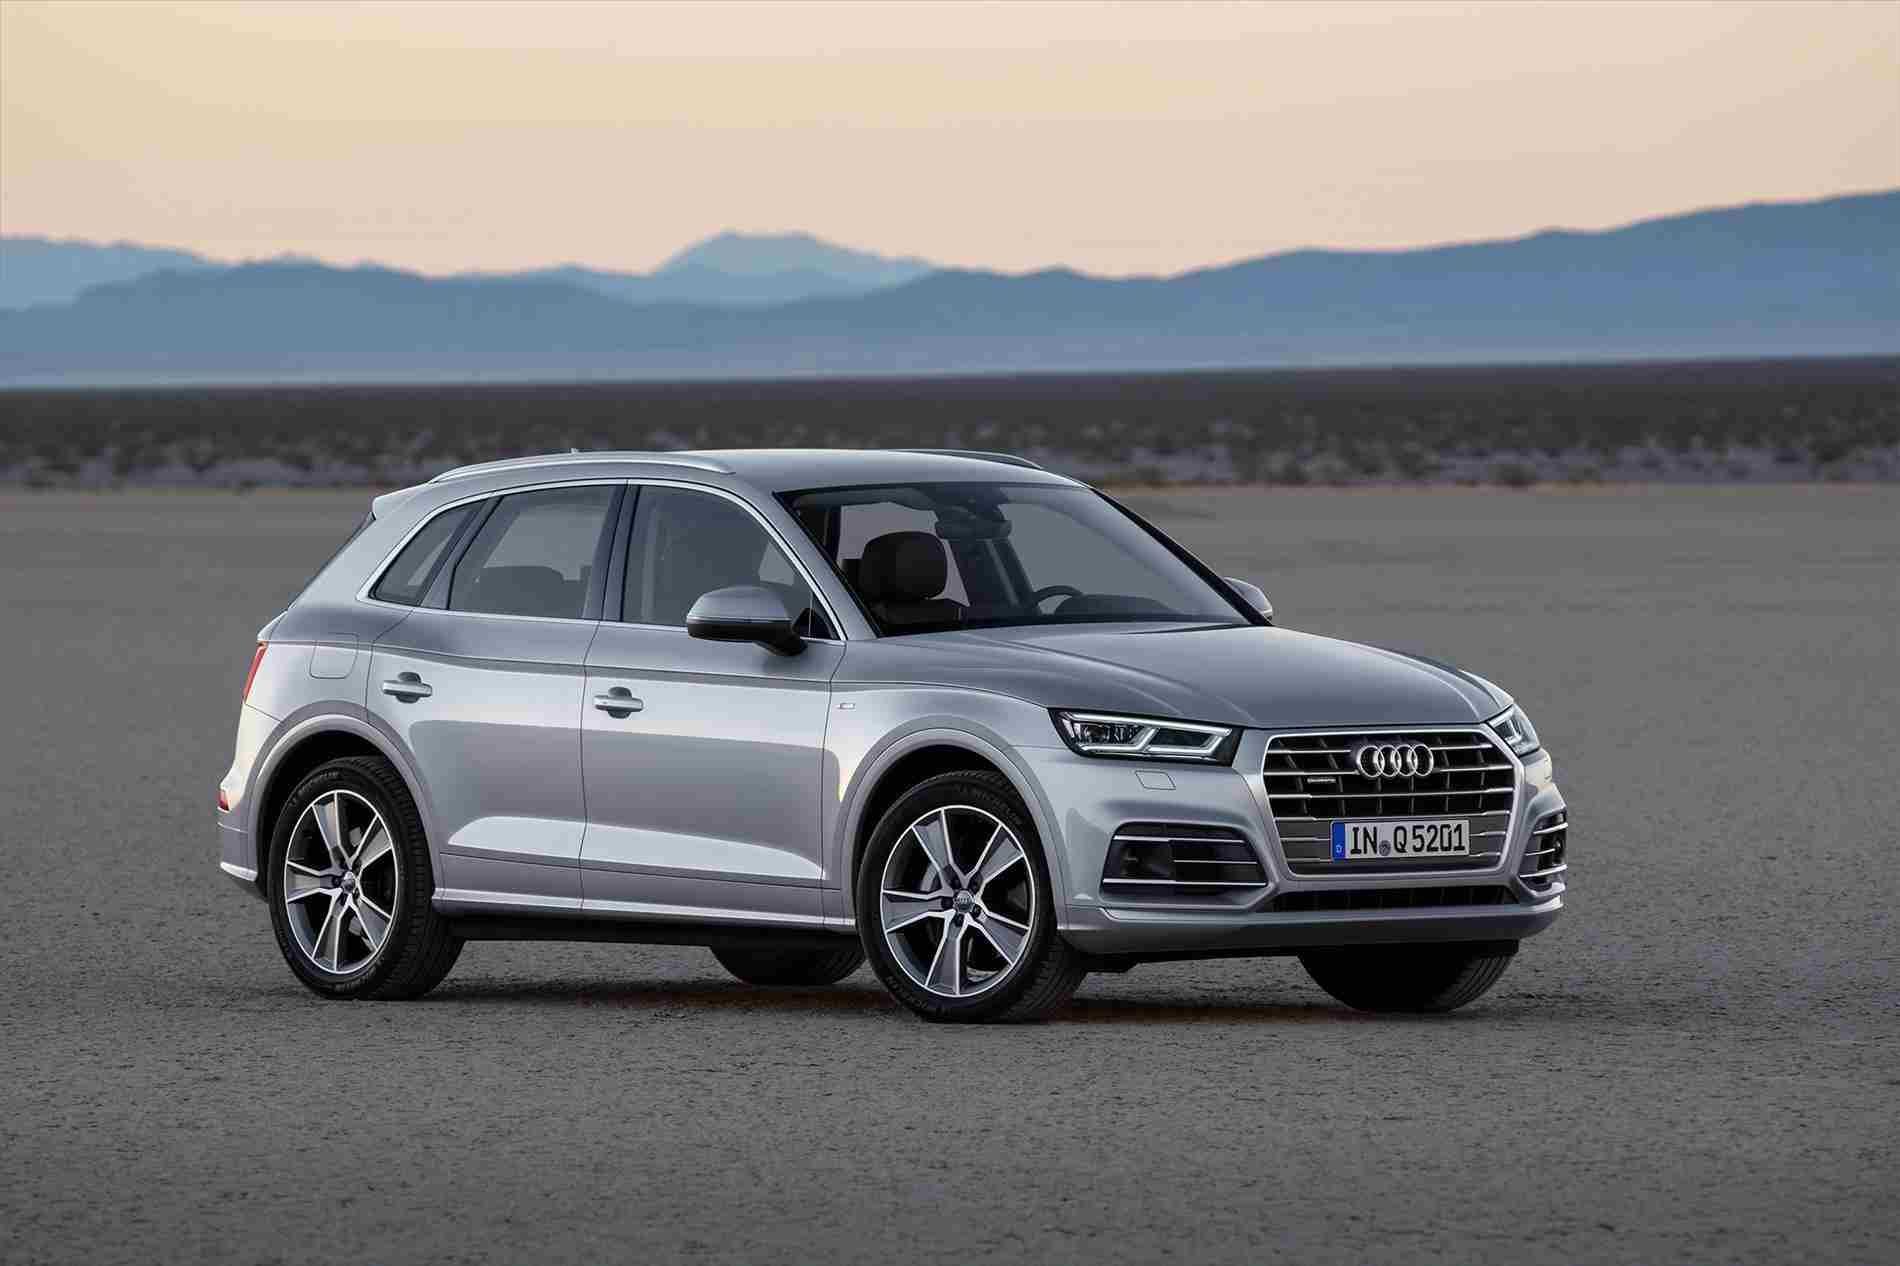 2018 Audi Q5 Hybrid Headlamp 2018 Audi Q5 Color Florett Silver Side Wallpaper 2018 Audi Q5 30 Tdi Quattro Co Best Midsize Suv Best Compact Suv Audi Q5